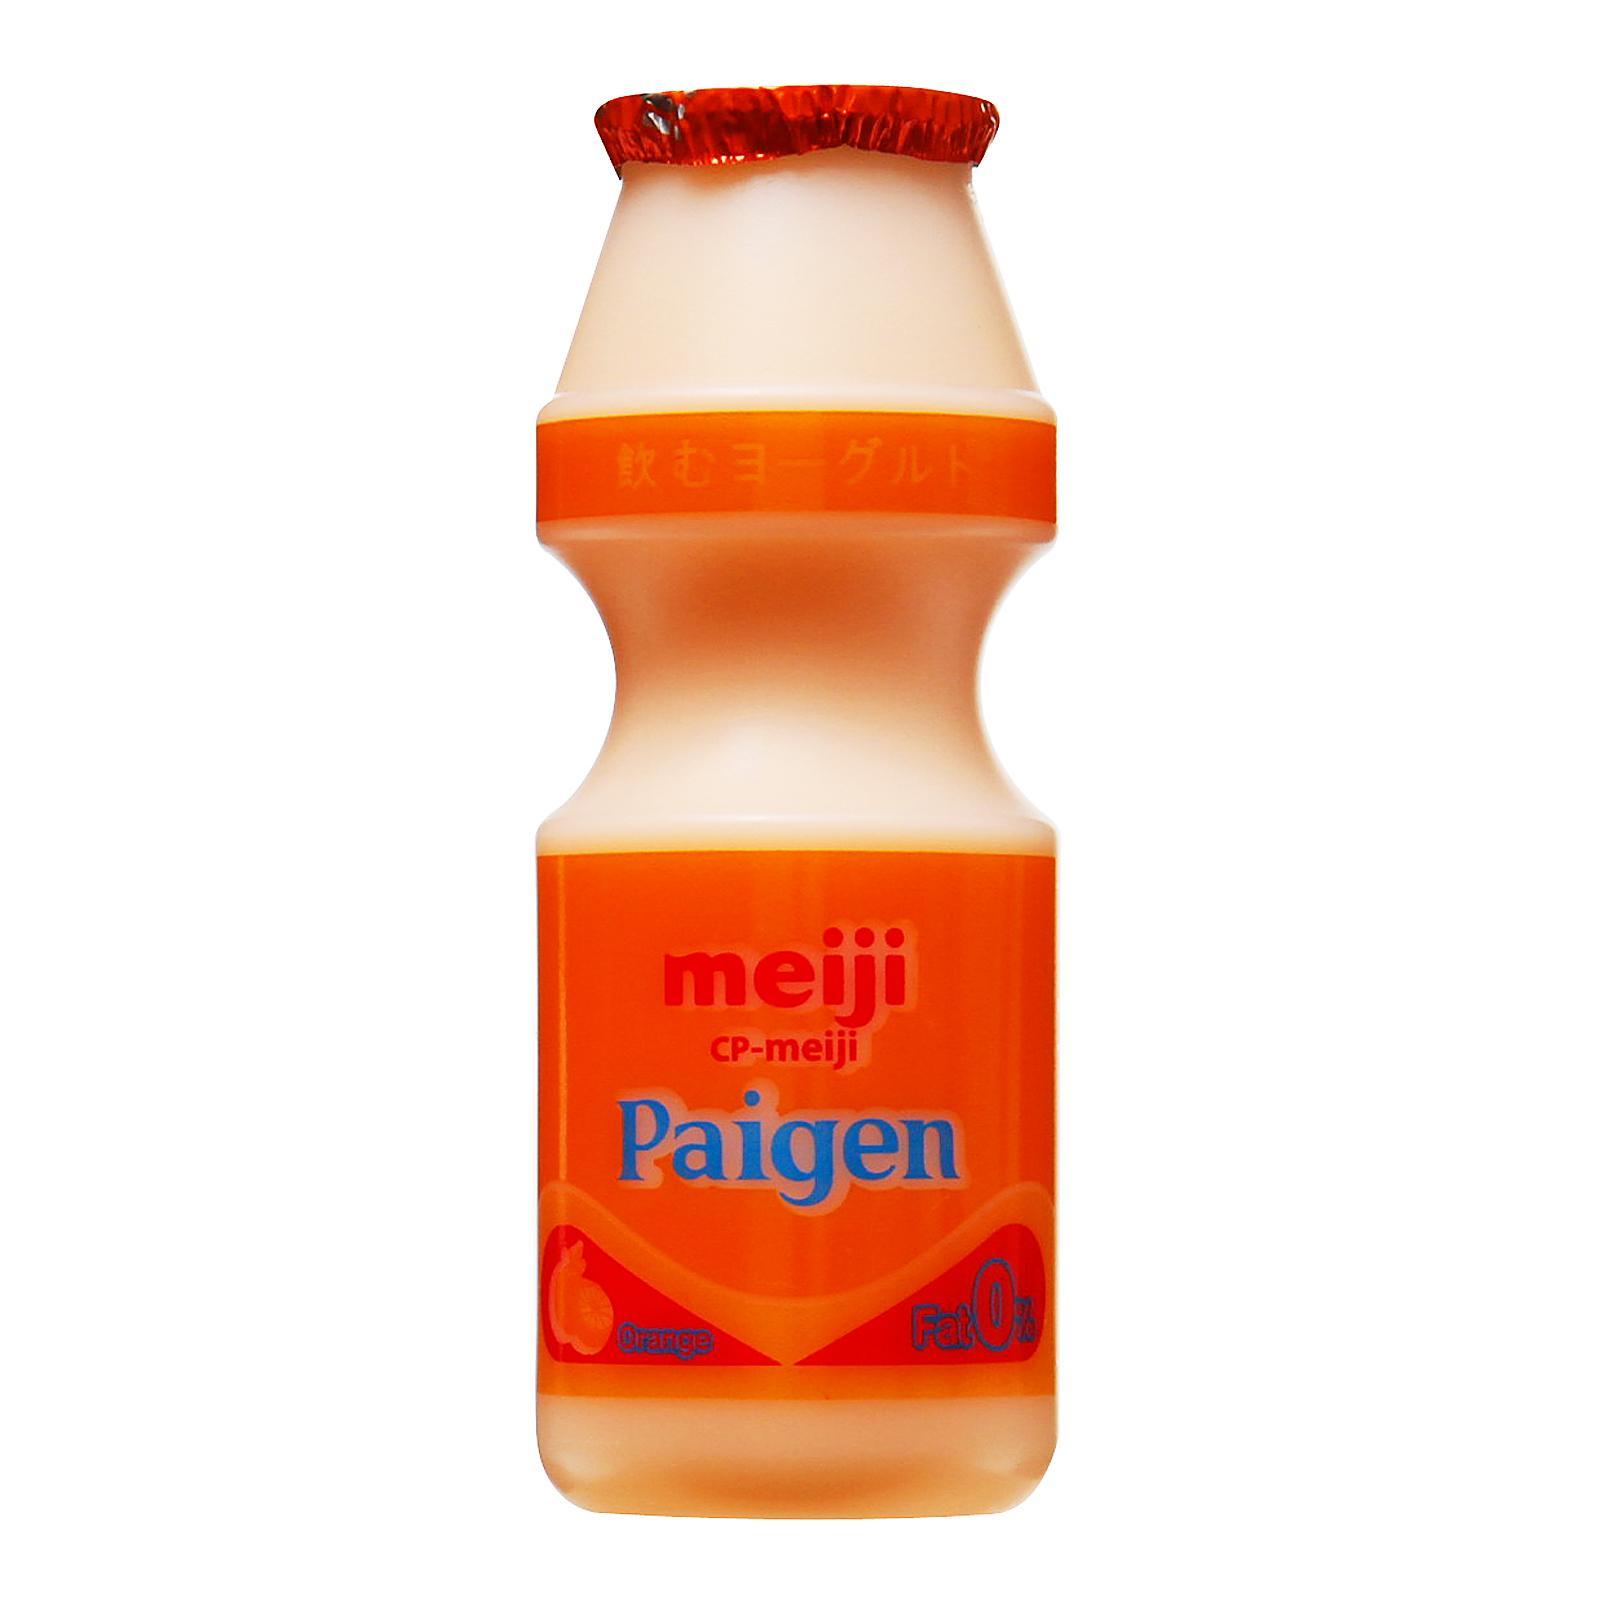 Meiji Paigen Culture Milk Orange Flavour